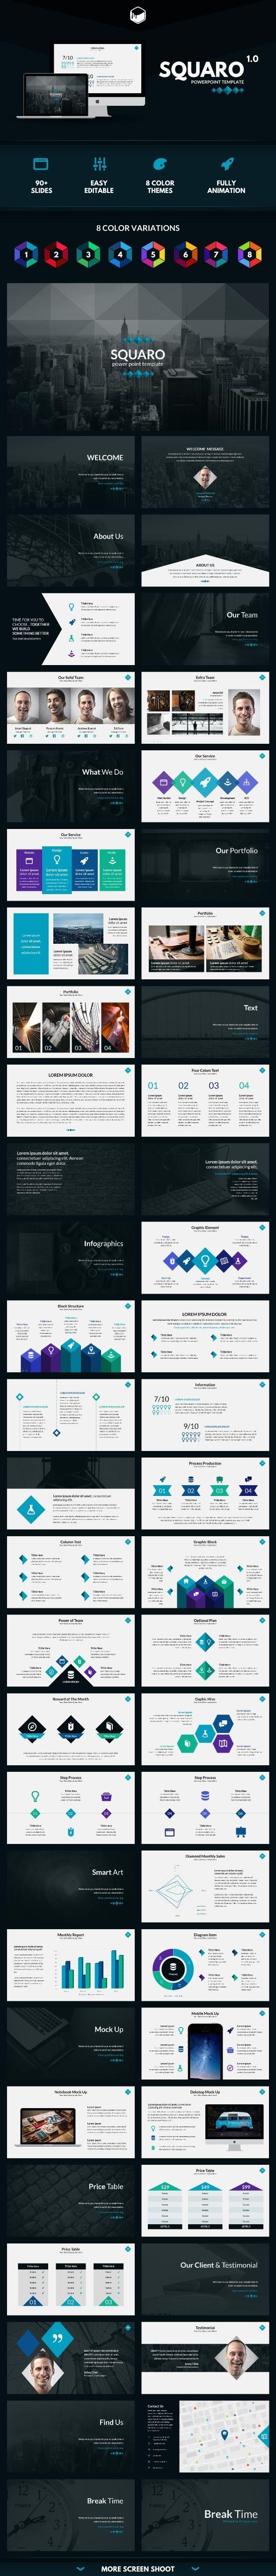 Squaro - PowerPoint Template #presentation Download: http://graphicriver.net/item/squaro-powerpoint-template/11408642?ref=ksioks